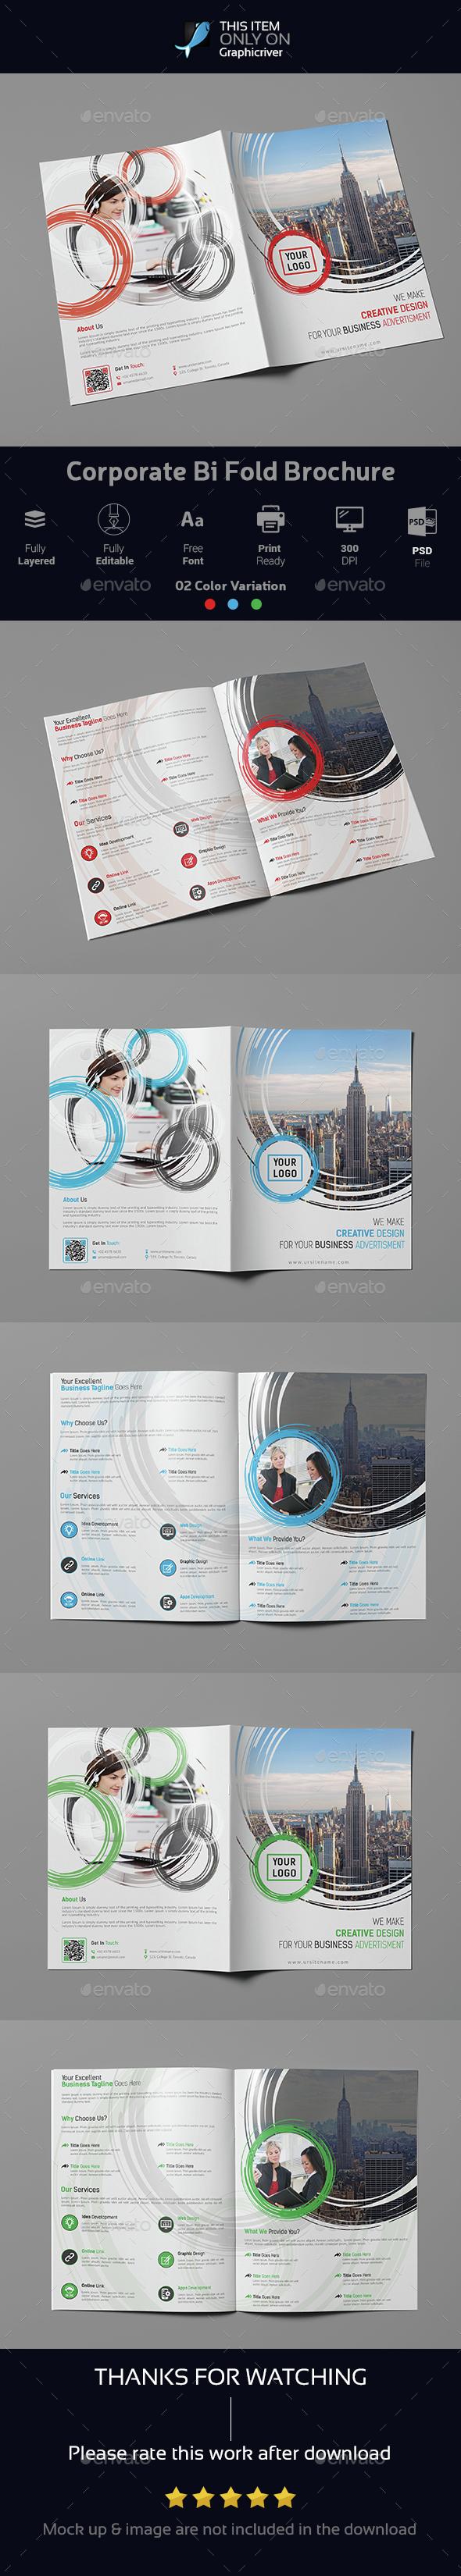 Corporate Bi Fold Brochure 02 - Brochures Print Templates